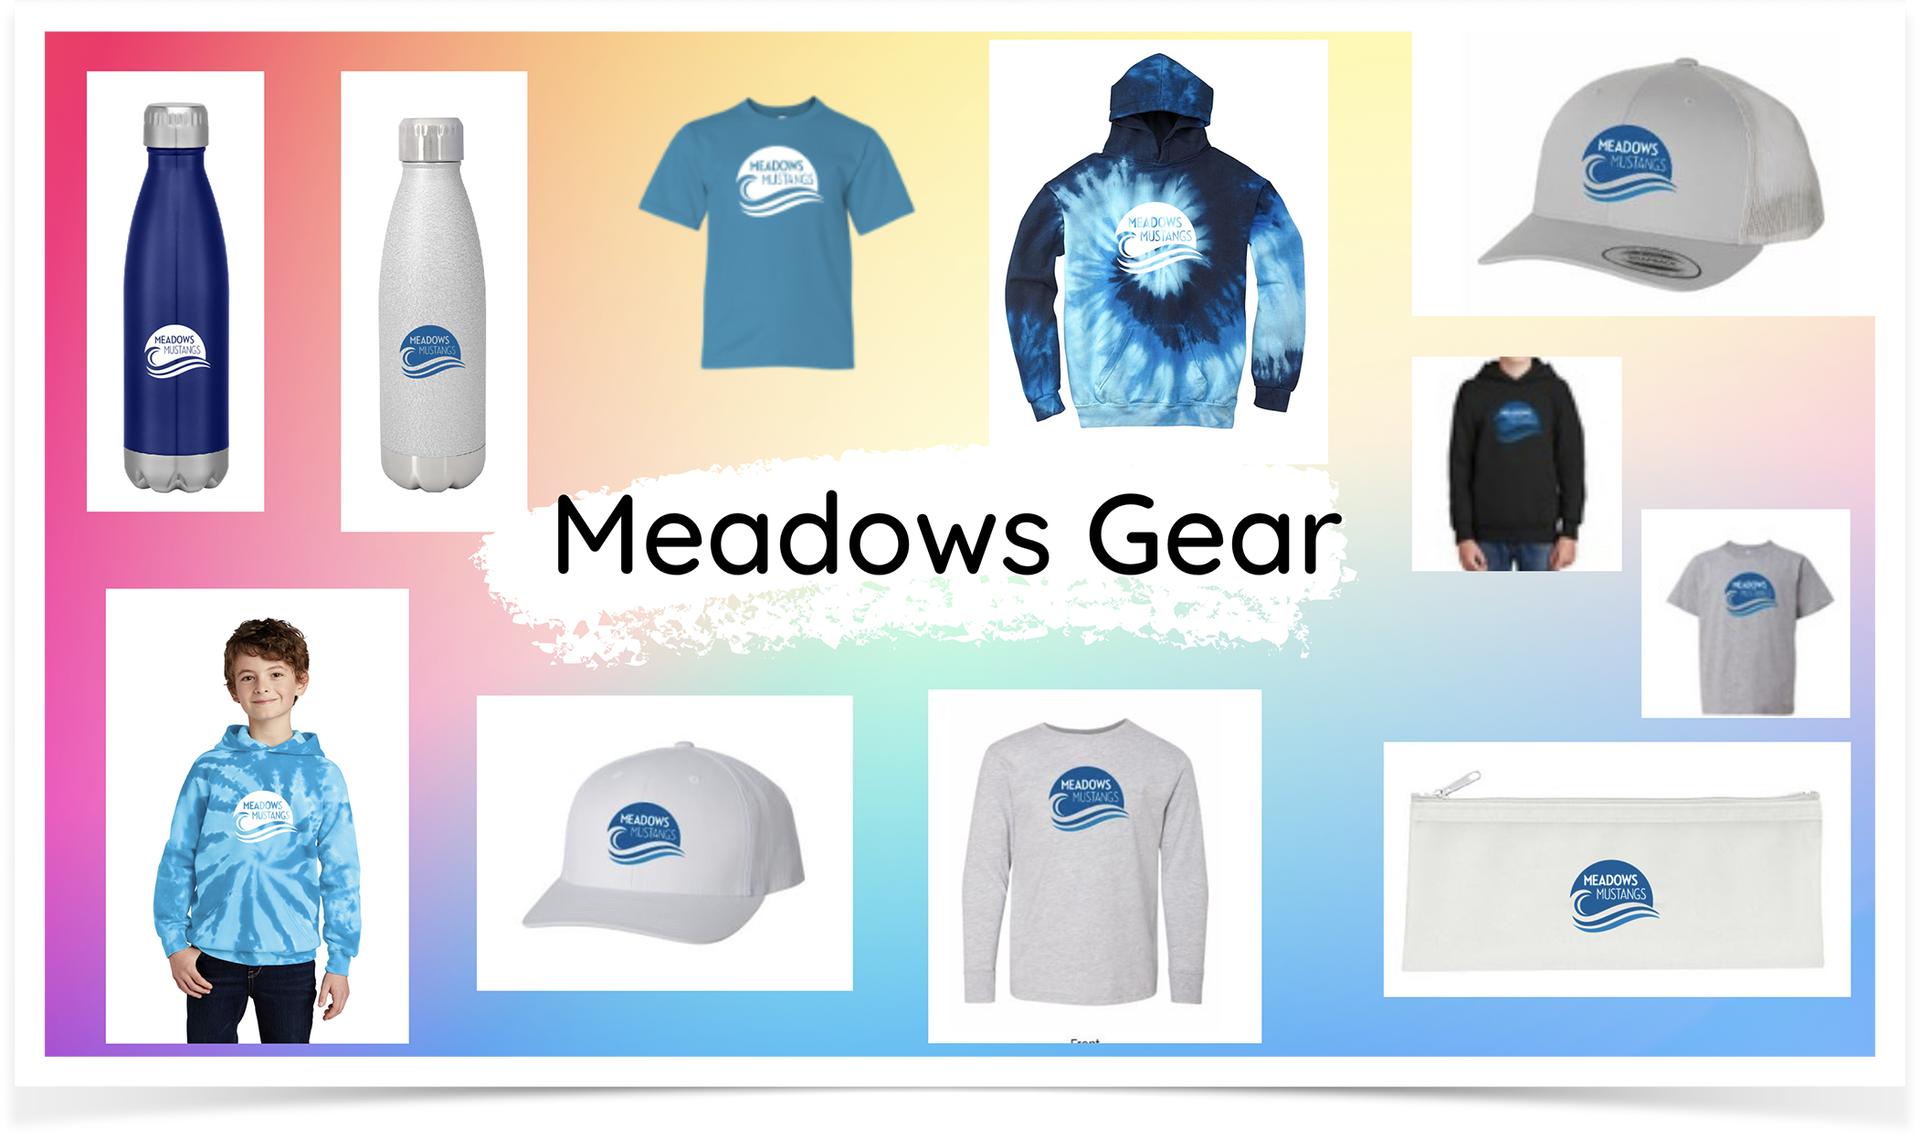 Meadows Gear